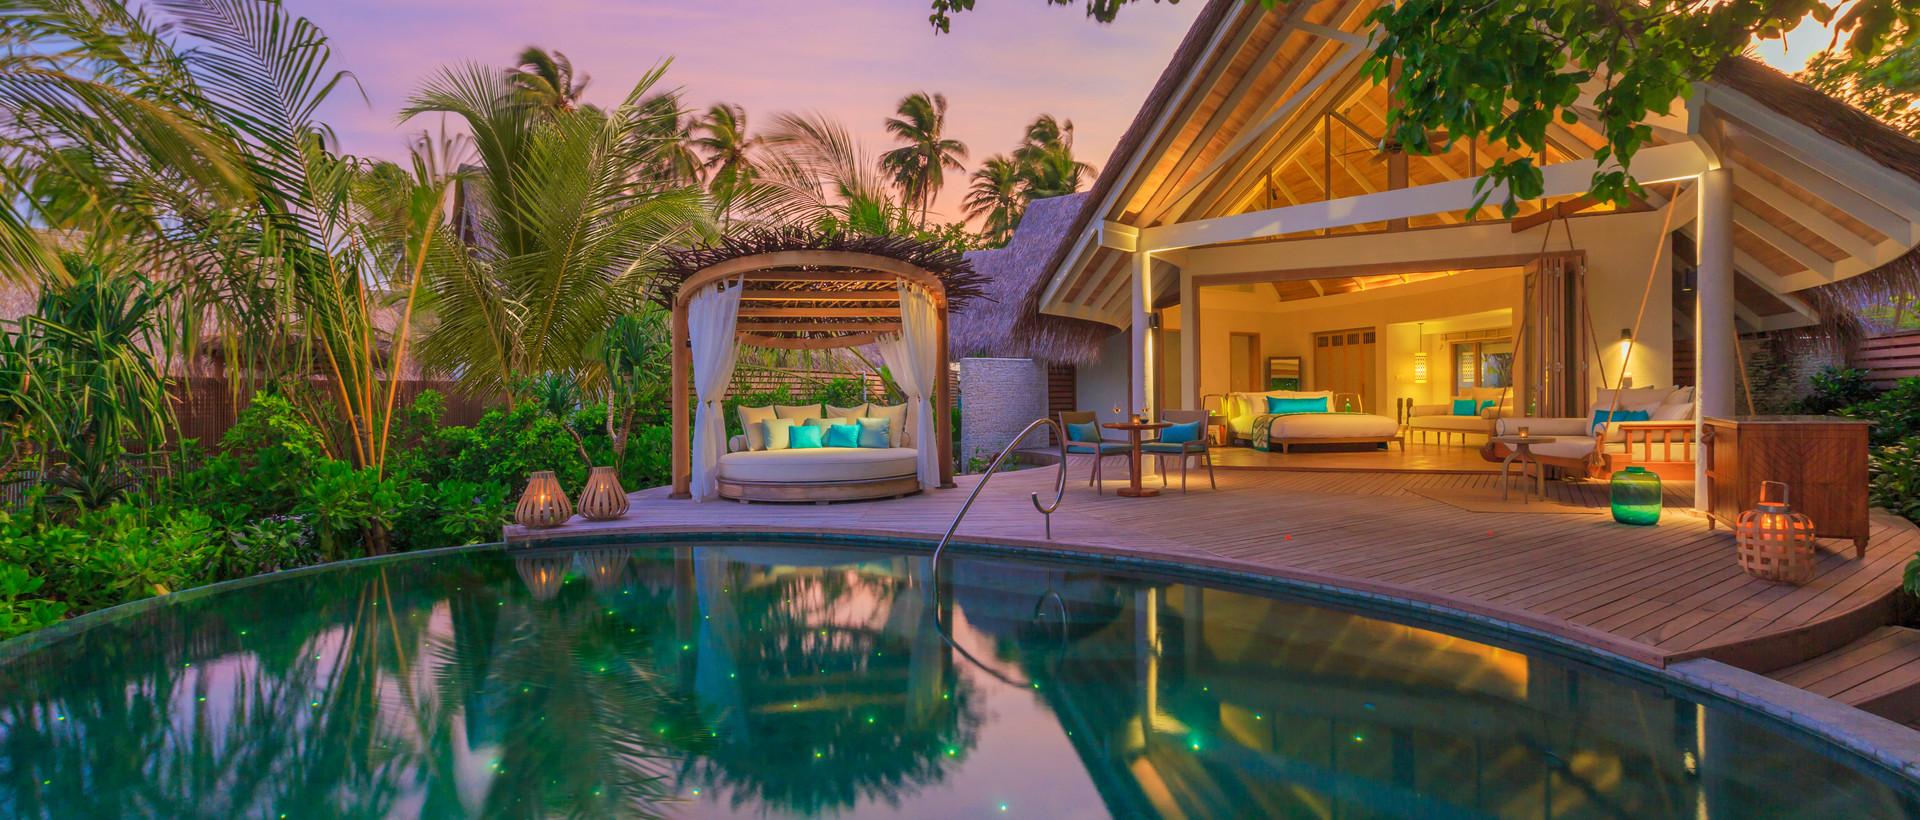 Milaidhoo Maldives Beach Pool Villa (3).